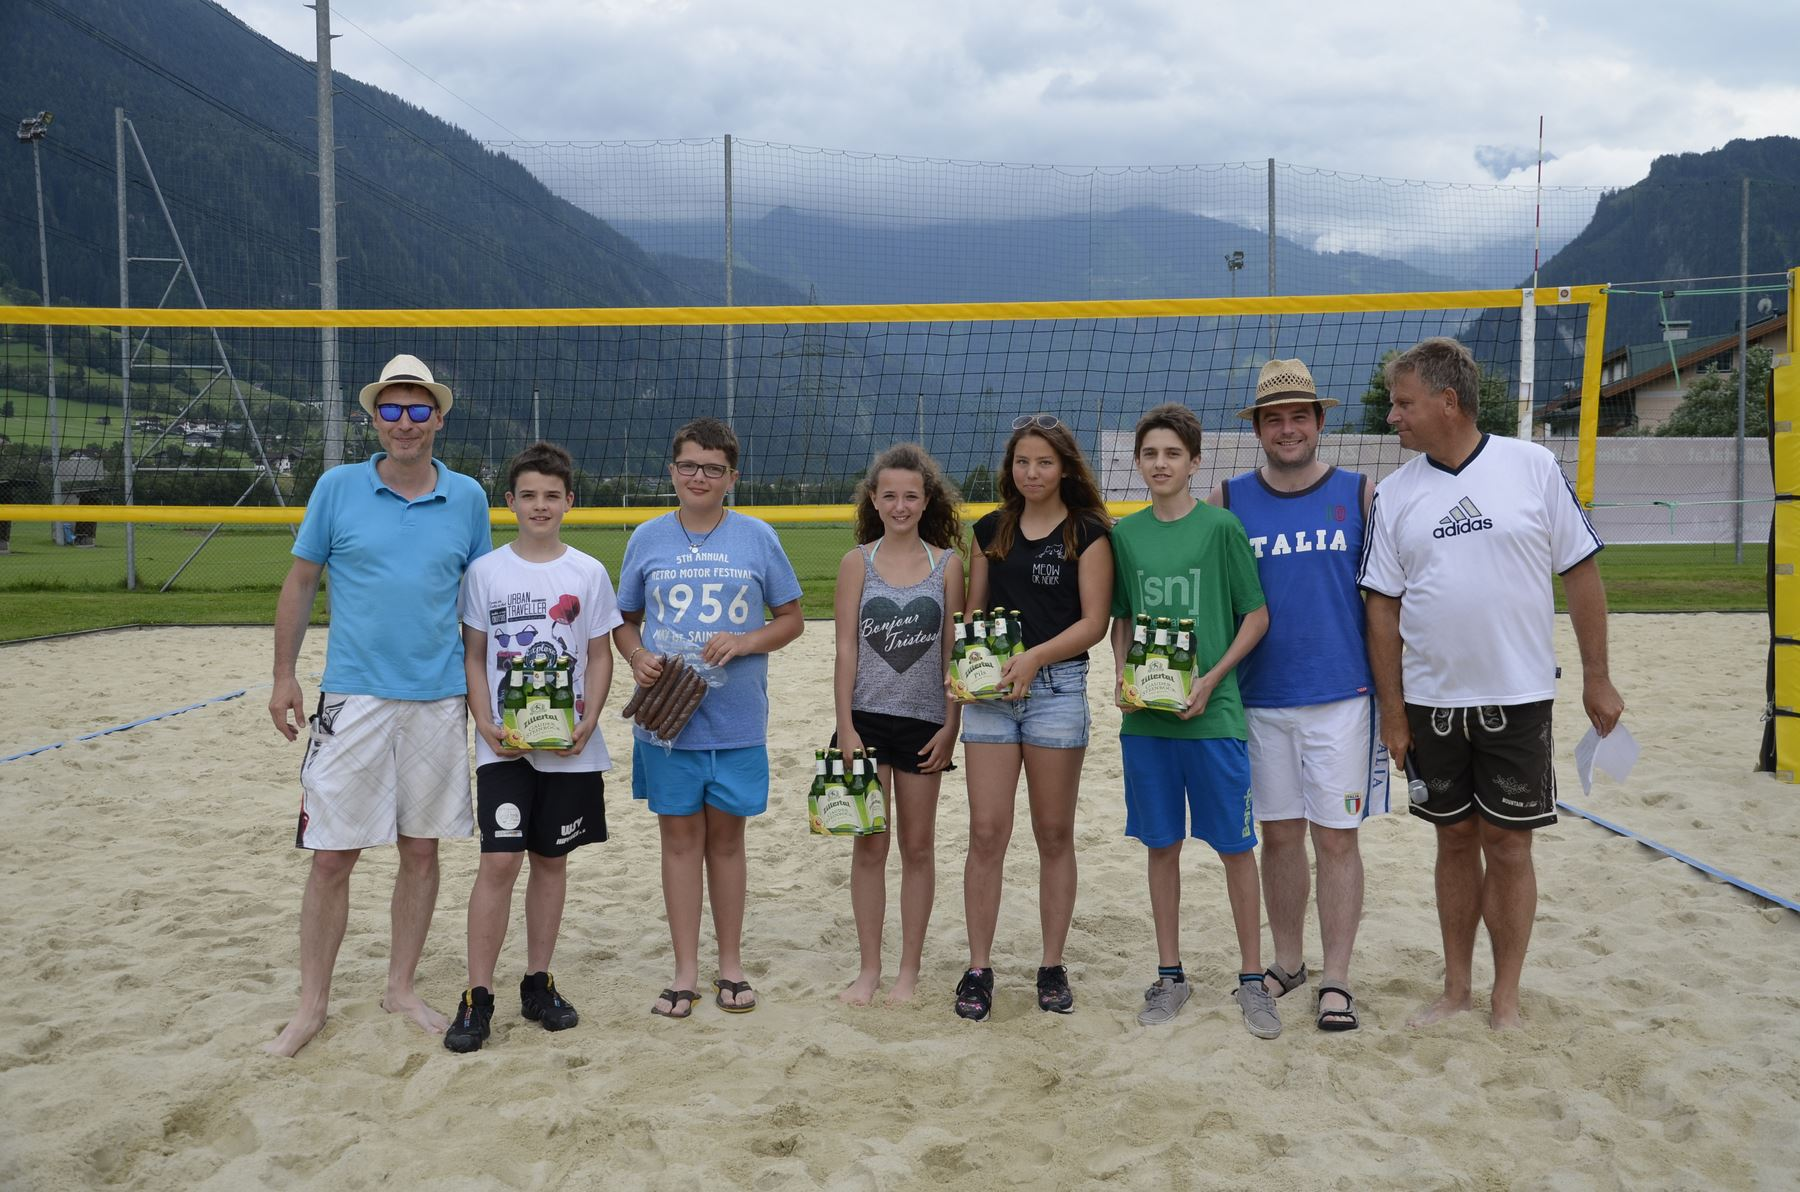 2016-07-02 Beachvolleyball 270